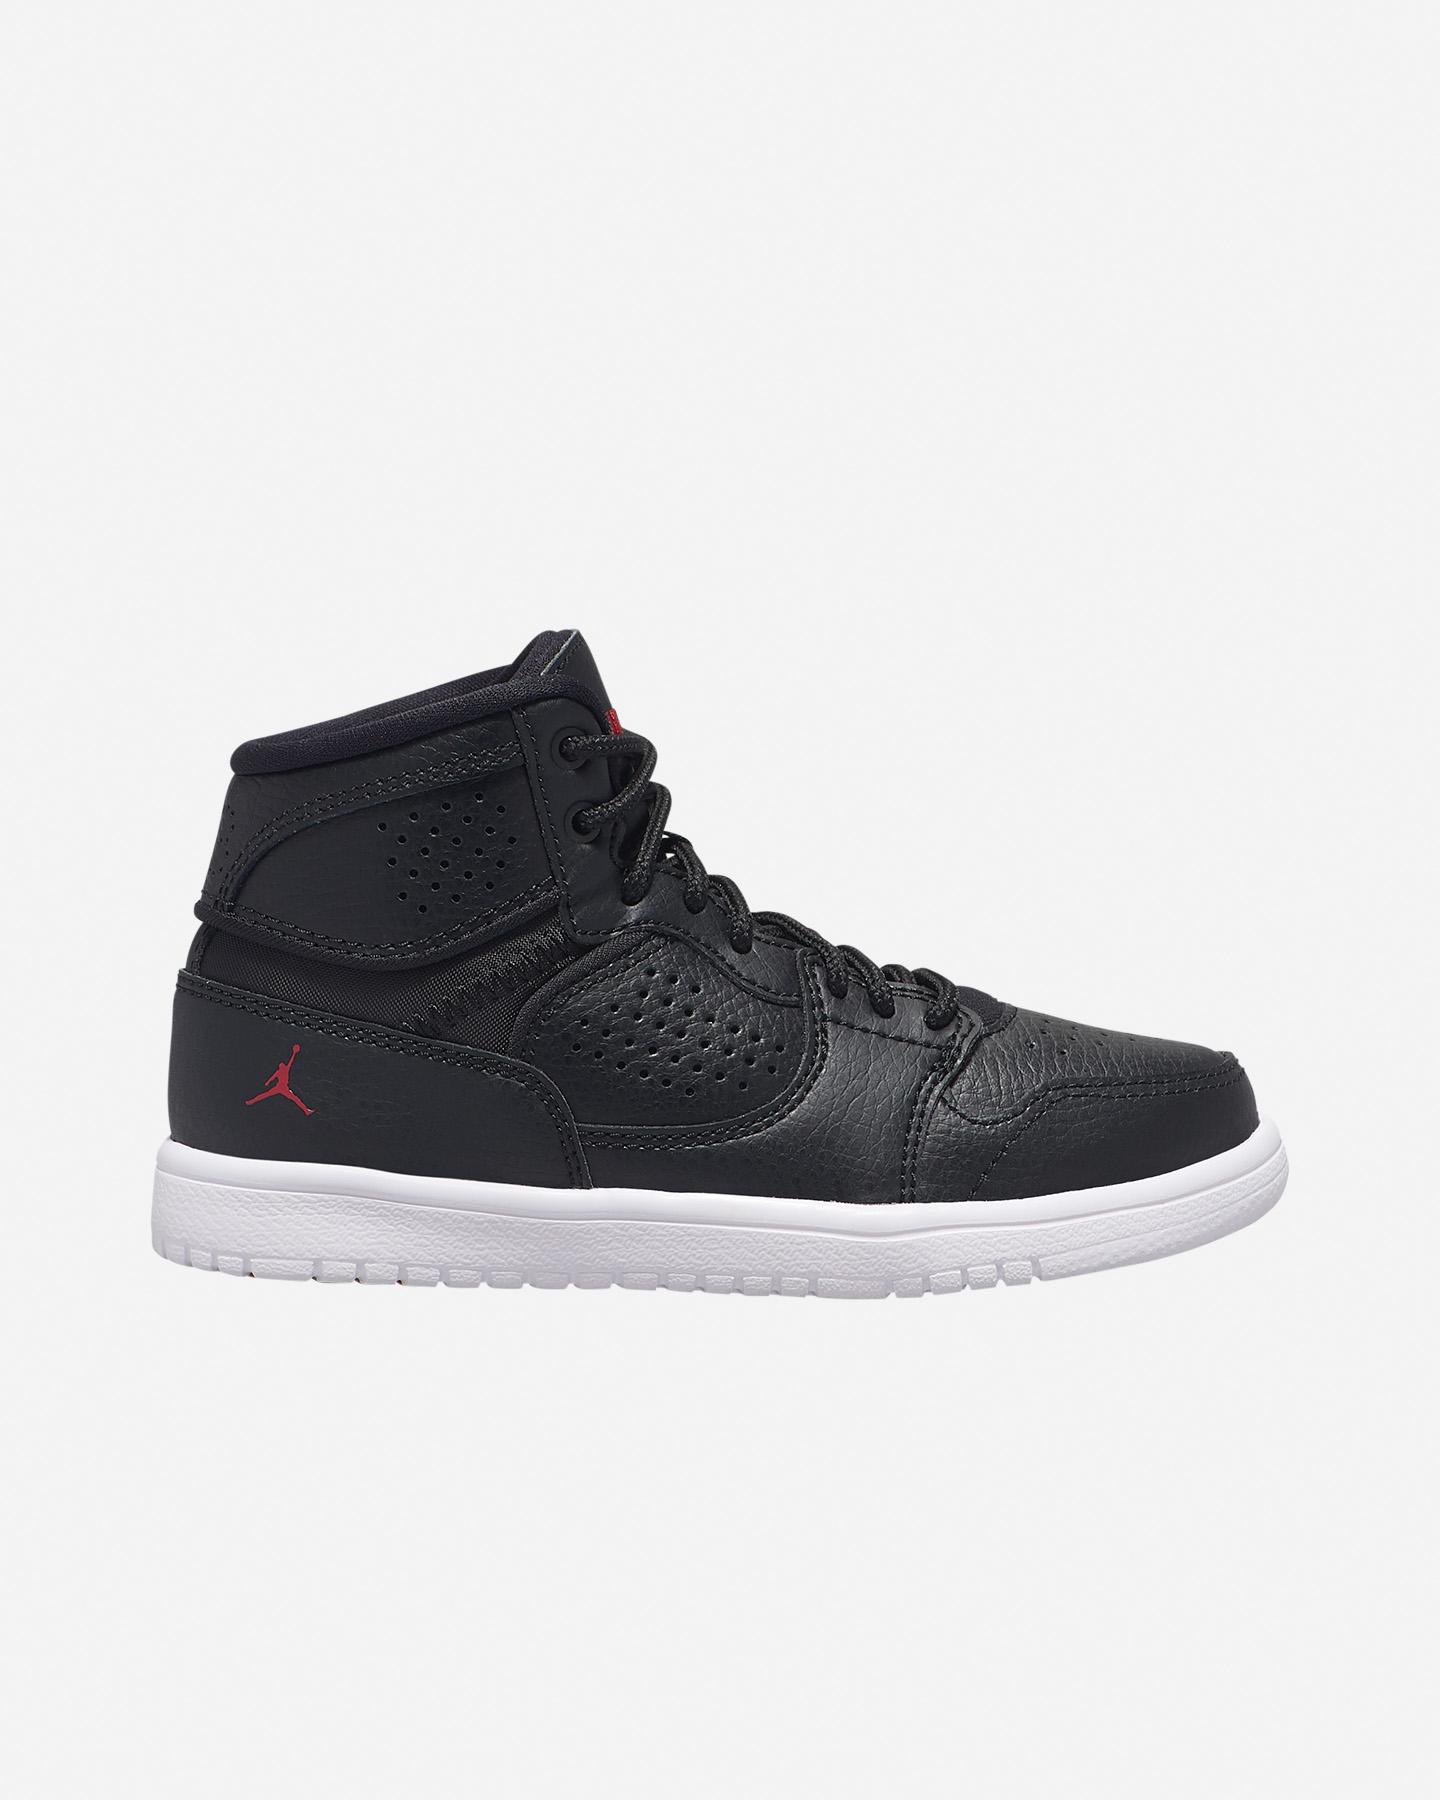 Dettagli su Nike Air Jordan Xx 20 Uomo Scarpe Sportive Alte 310455 003 Scarpe da Tennis